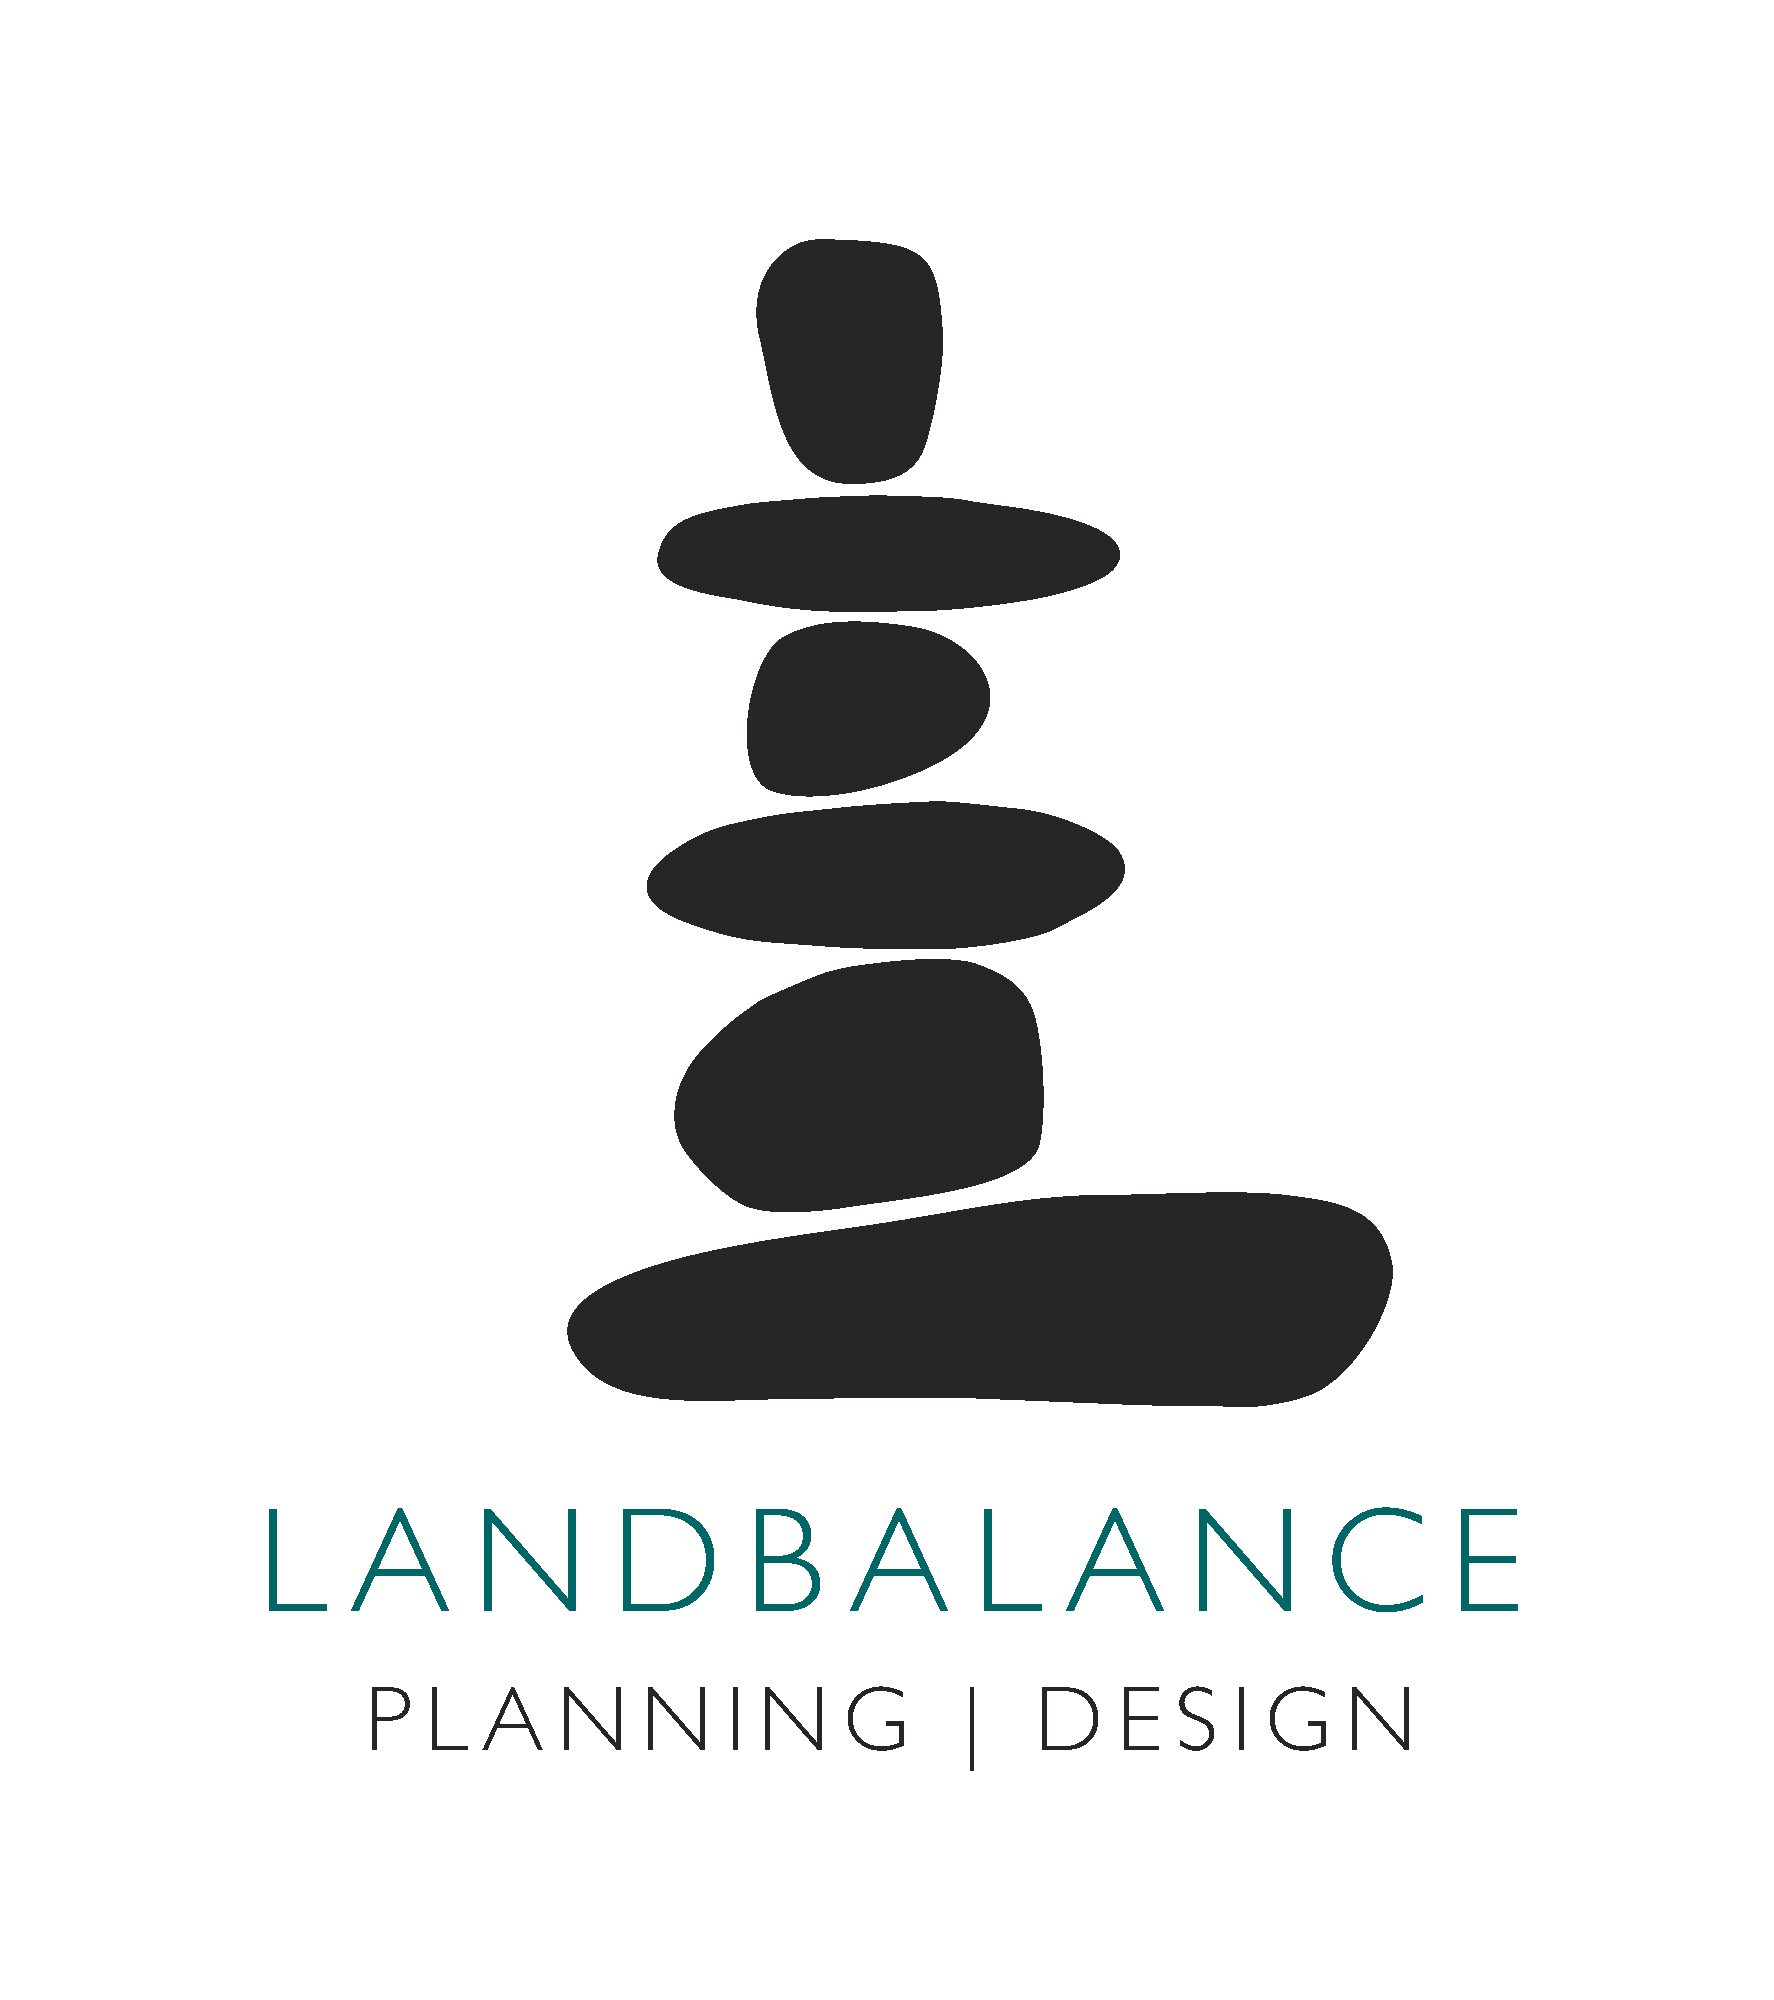 Land Balance Planning Design